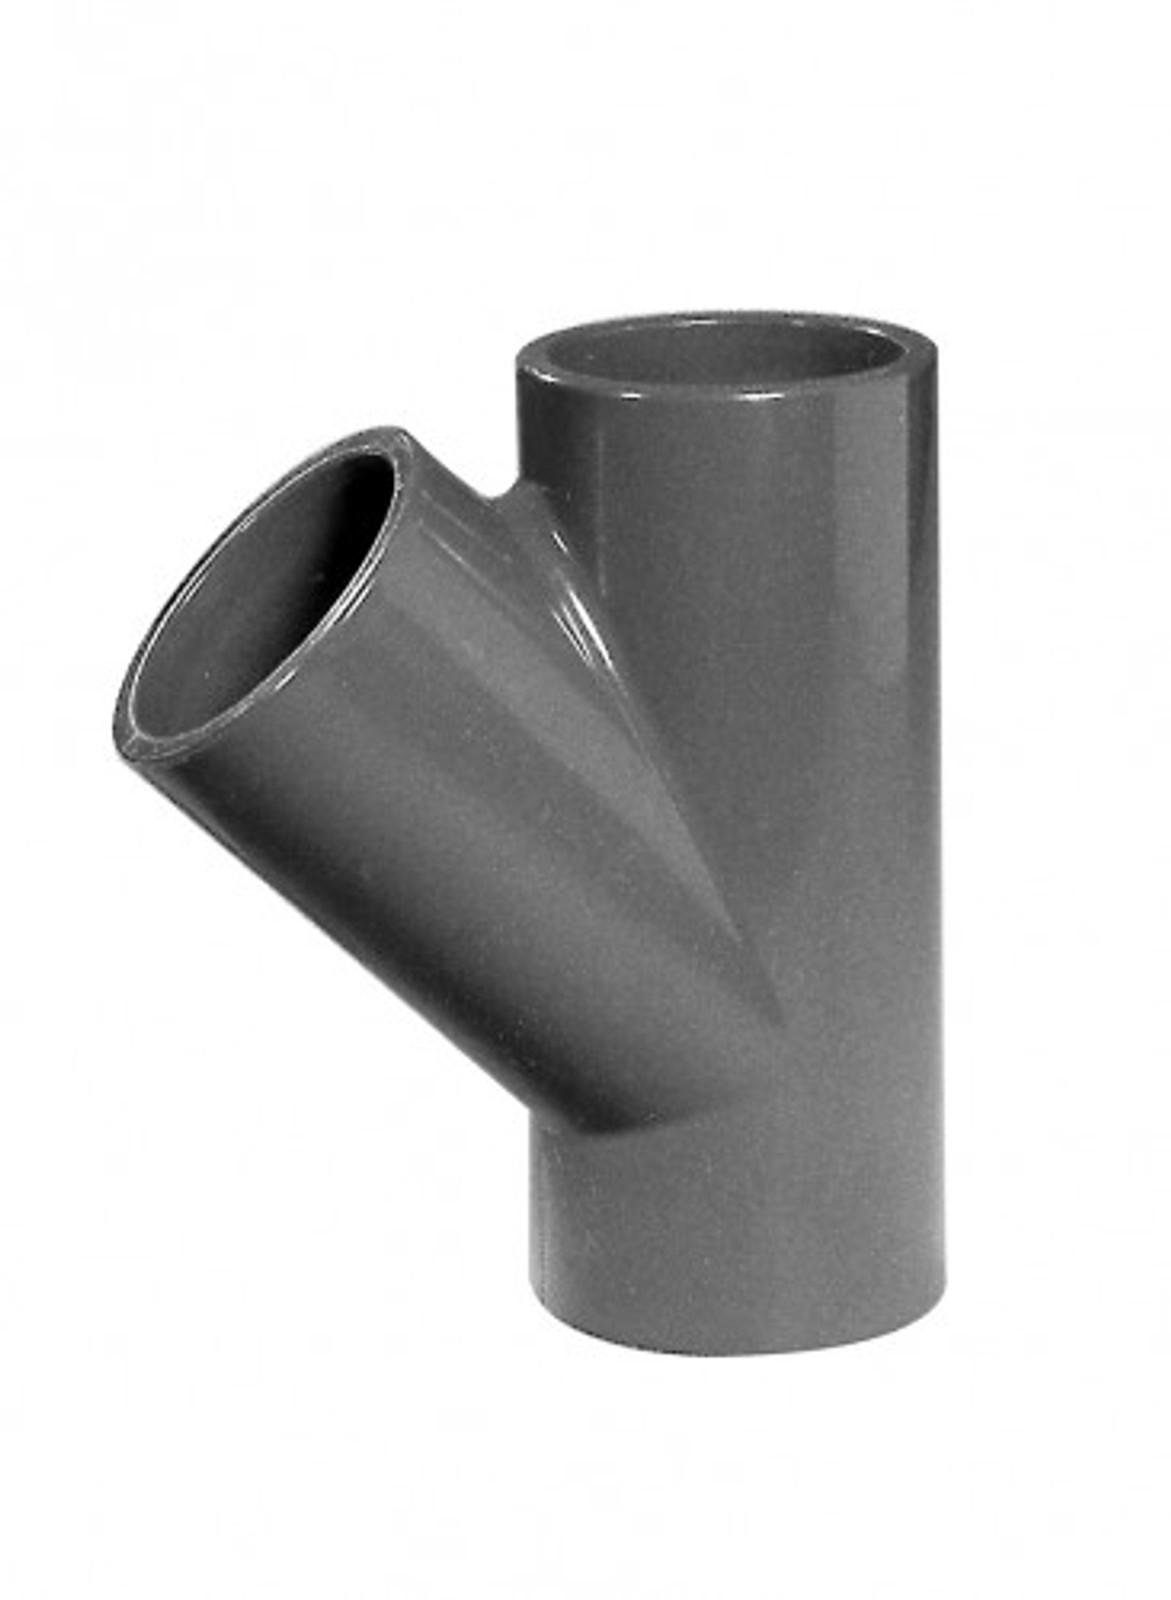 T-Stück 45°, 110 mm aus PVC